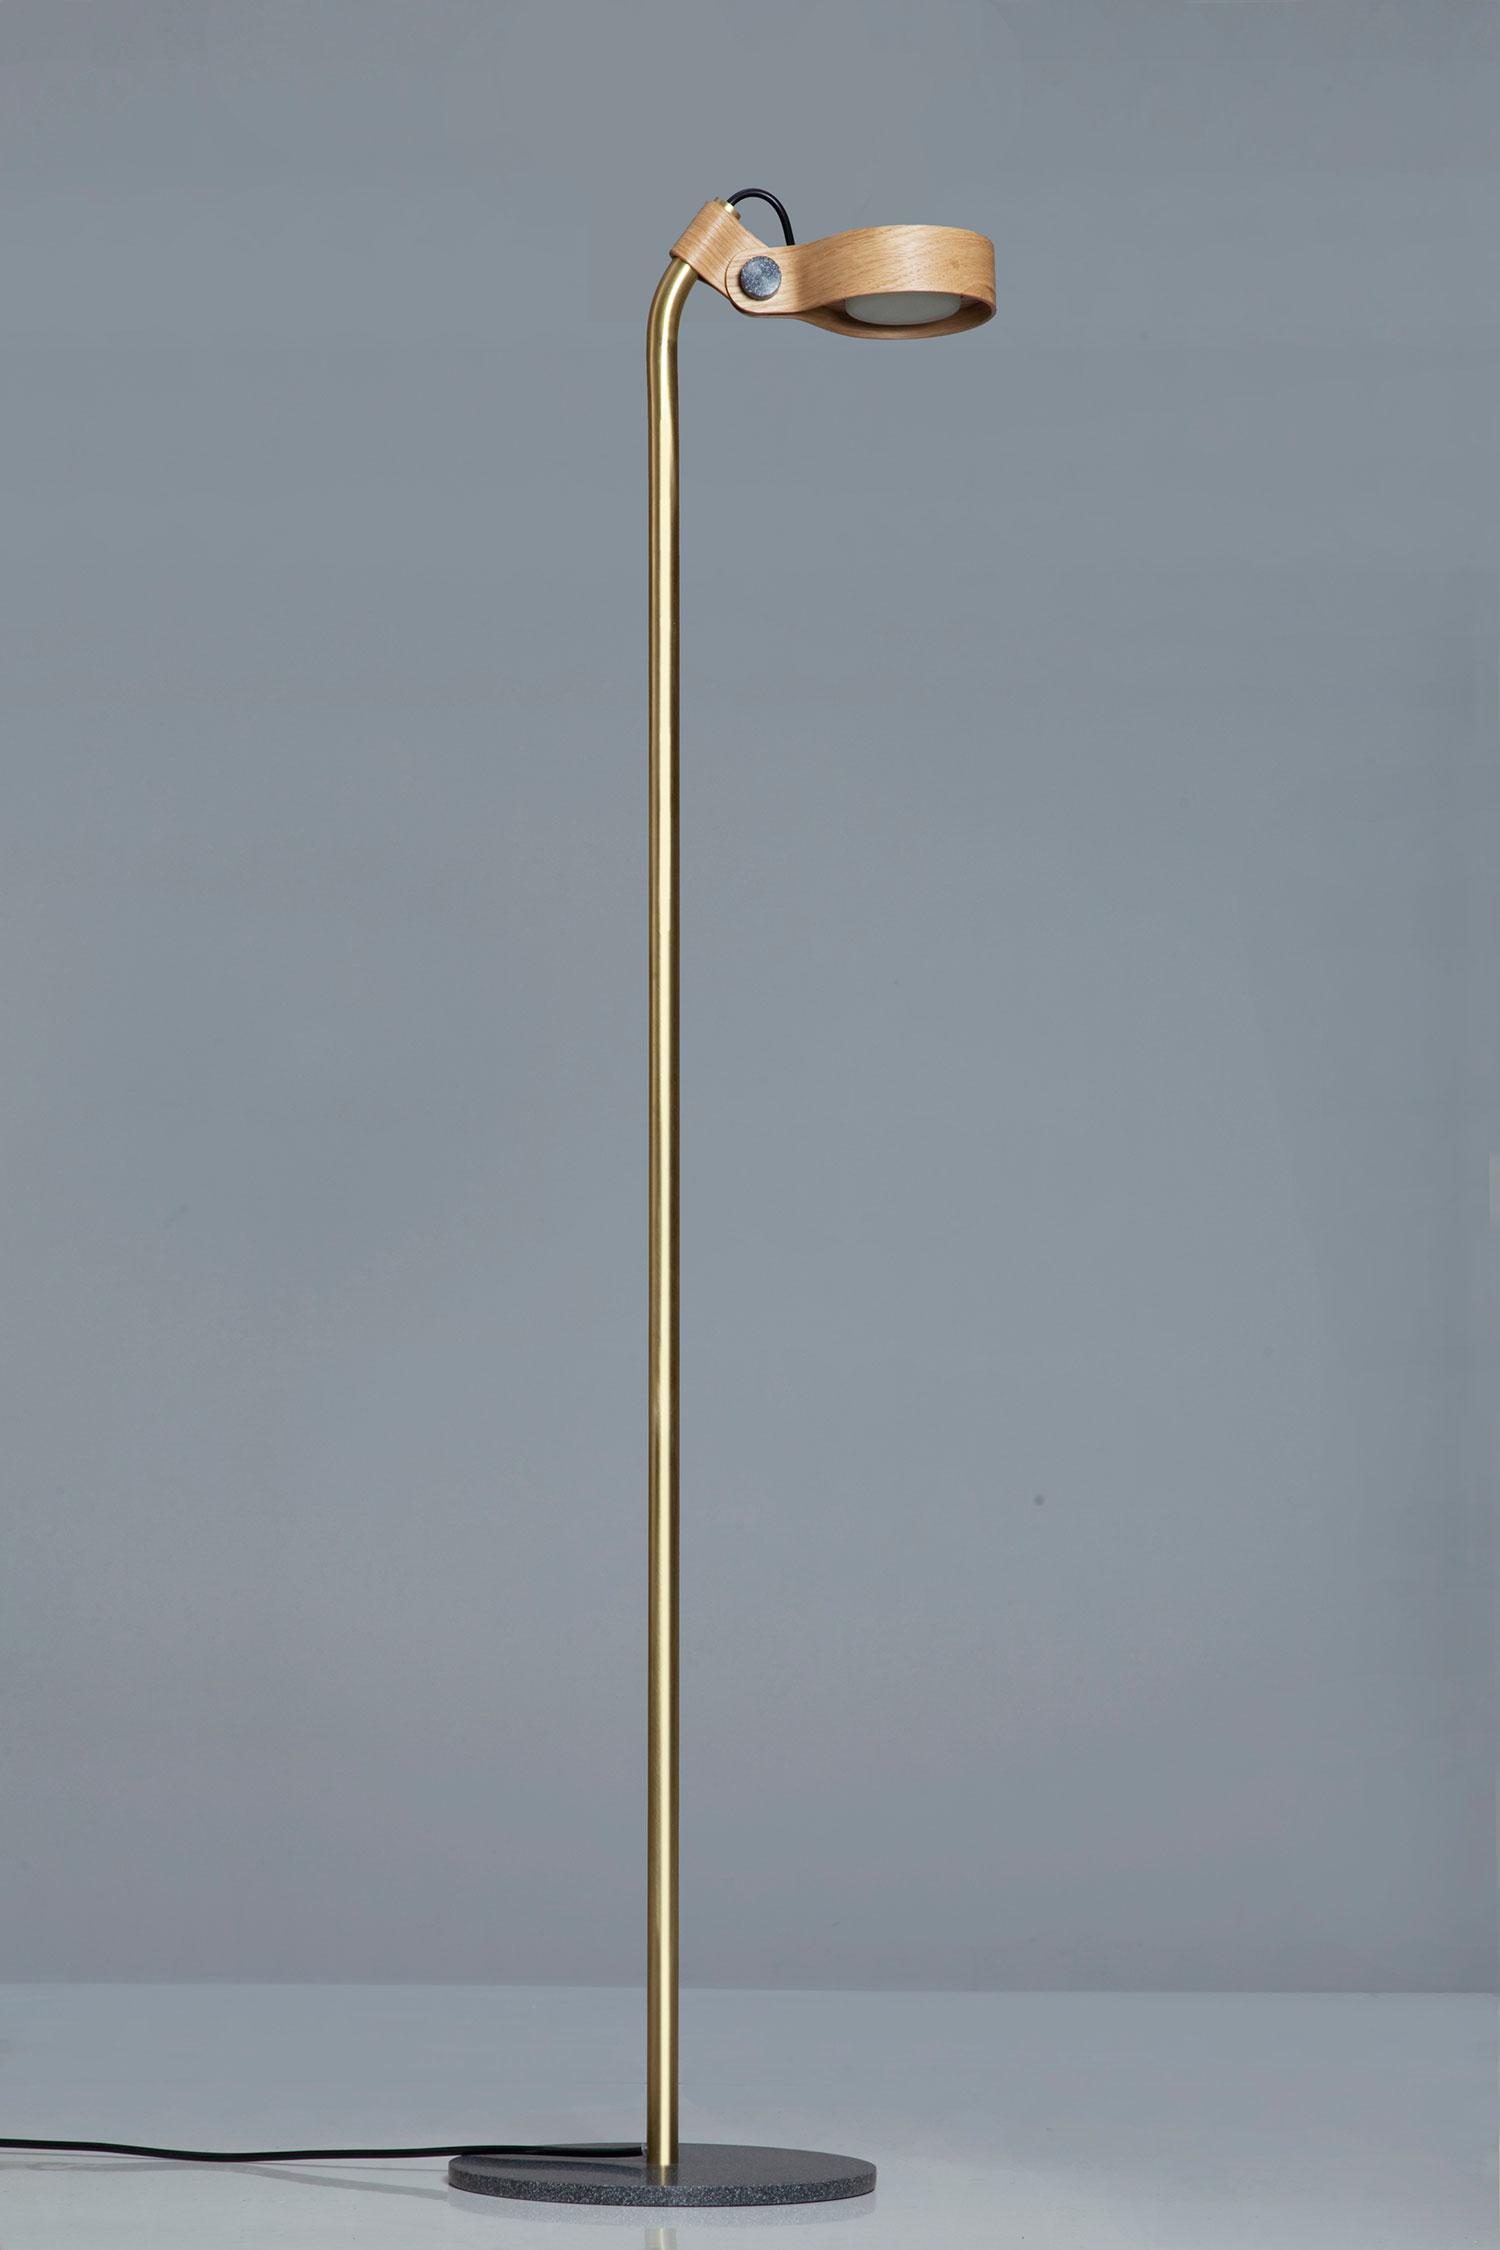 Handmade Light by Asaf Weinbroom | Yellowtrace.